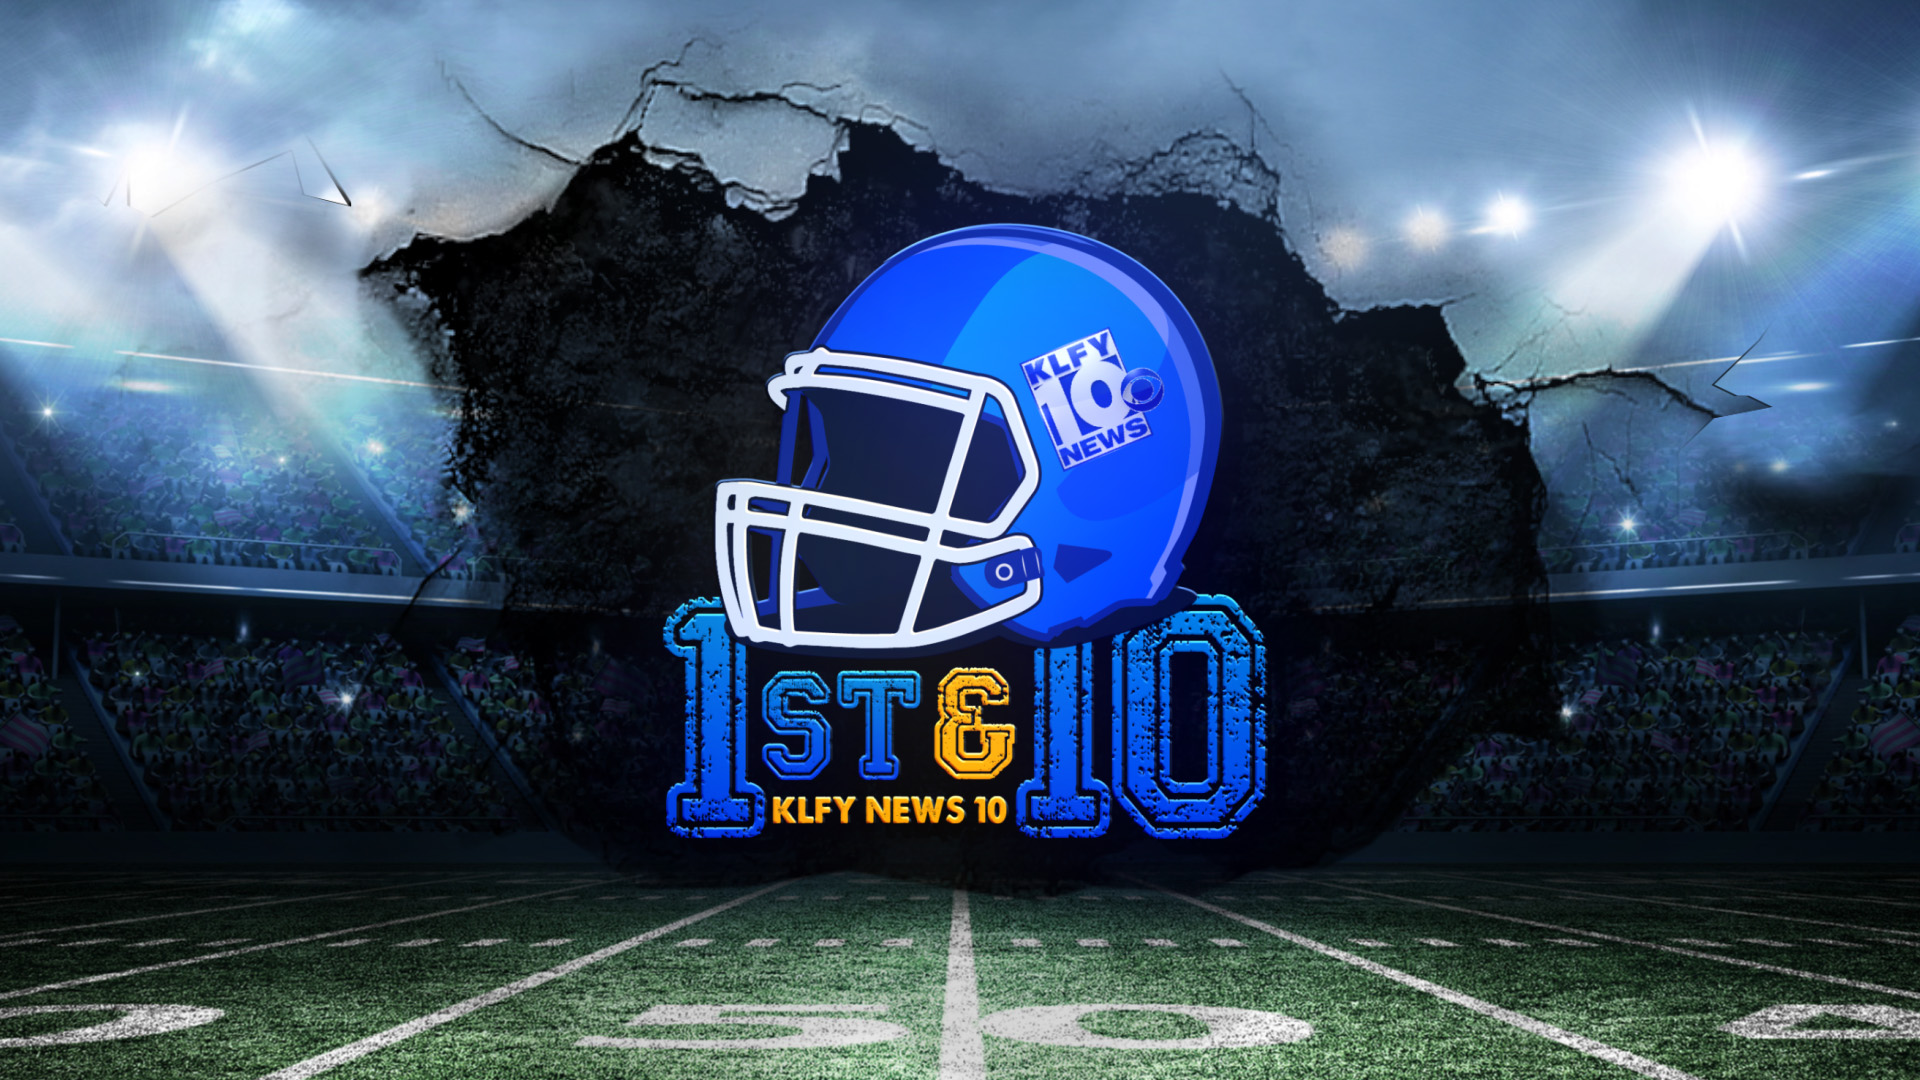 1st and 10 main logo